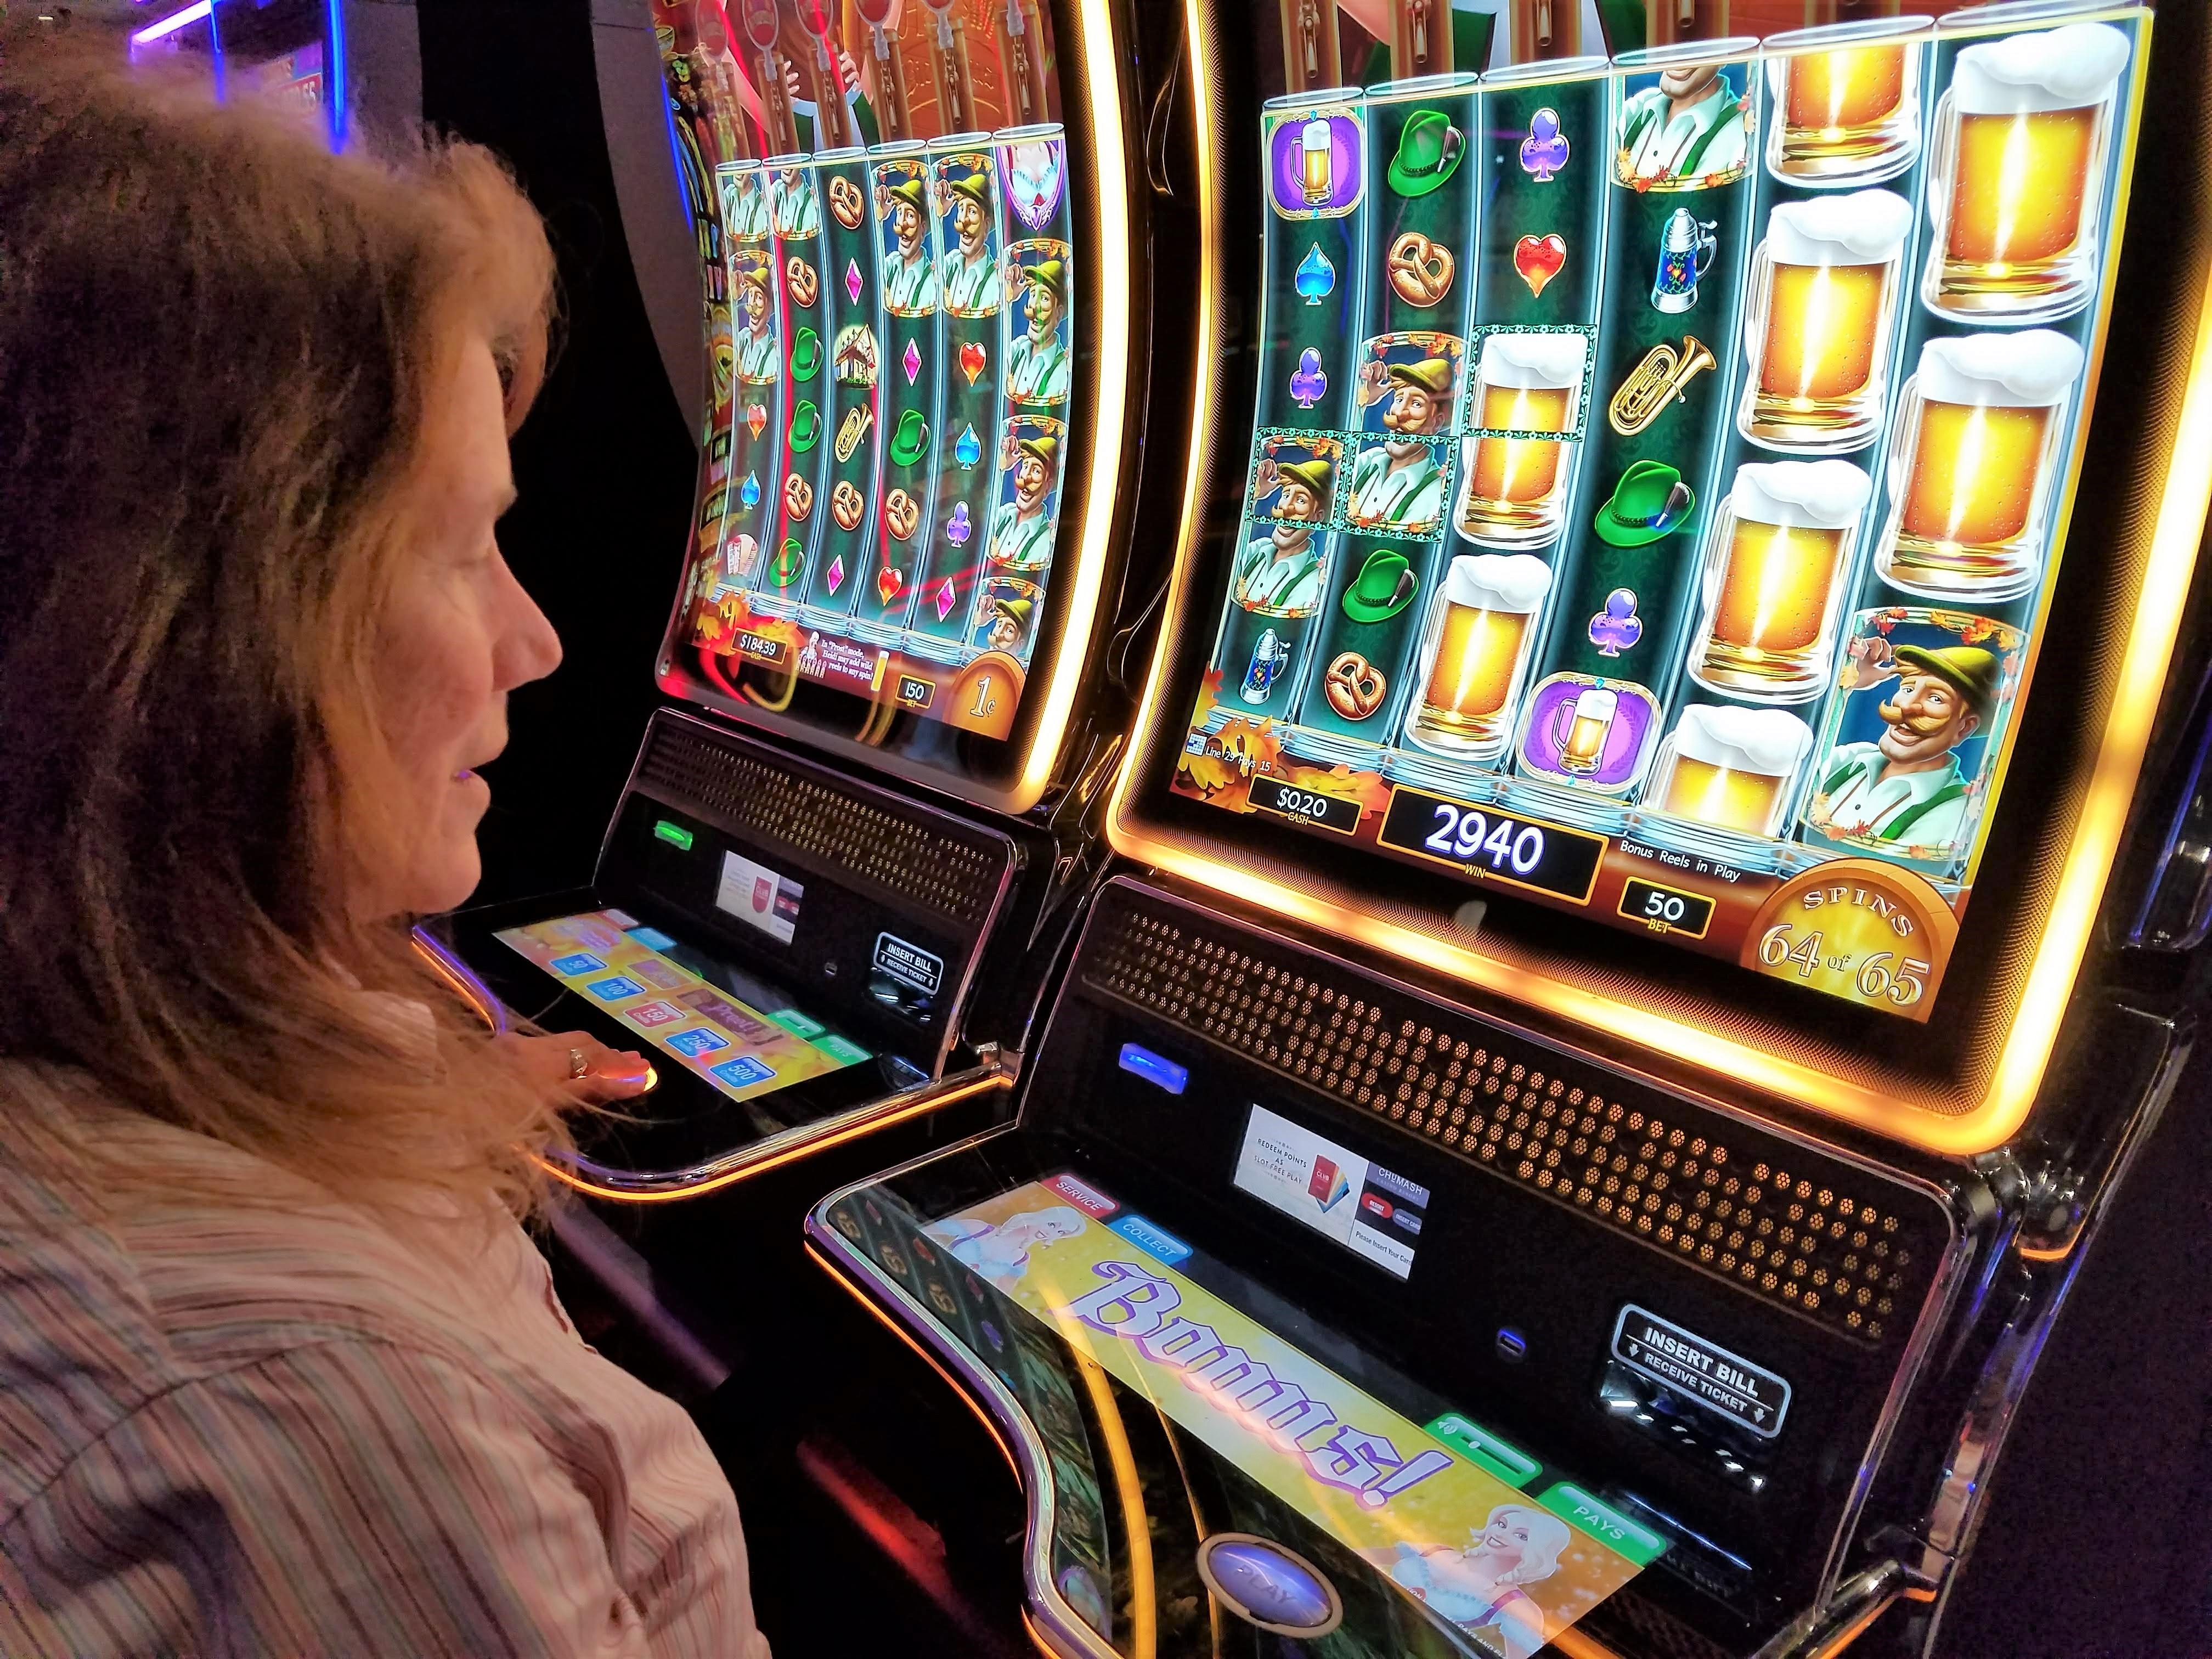 Chumash casino sports betting no limit texas hold em rules betting